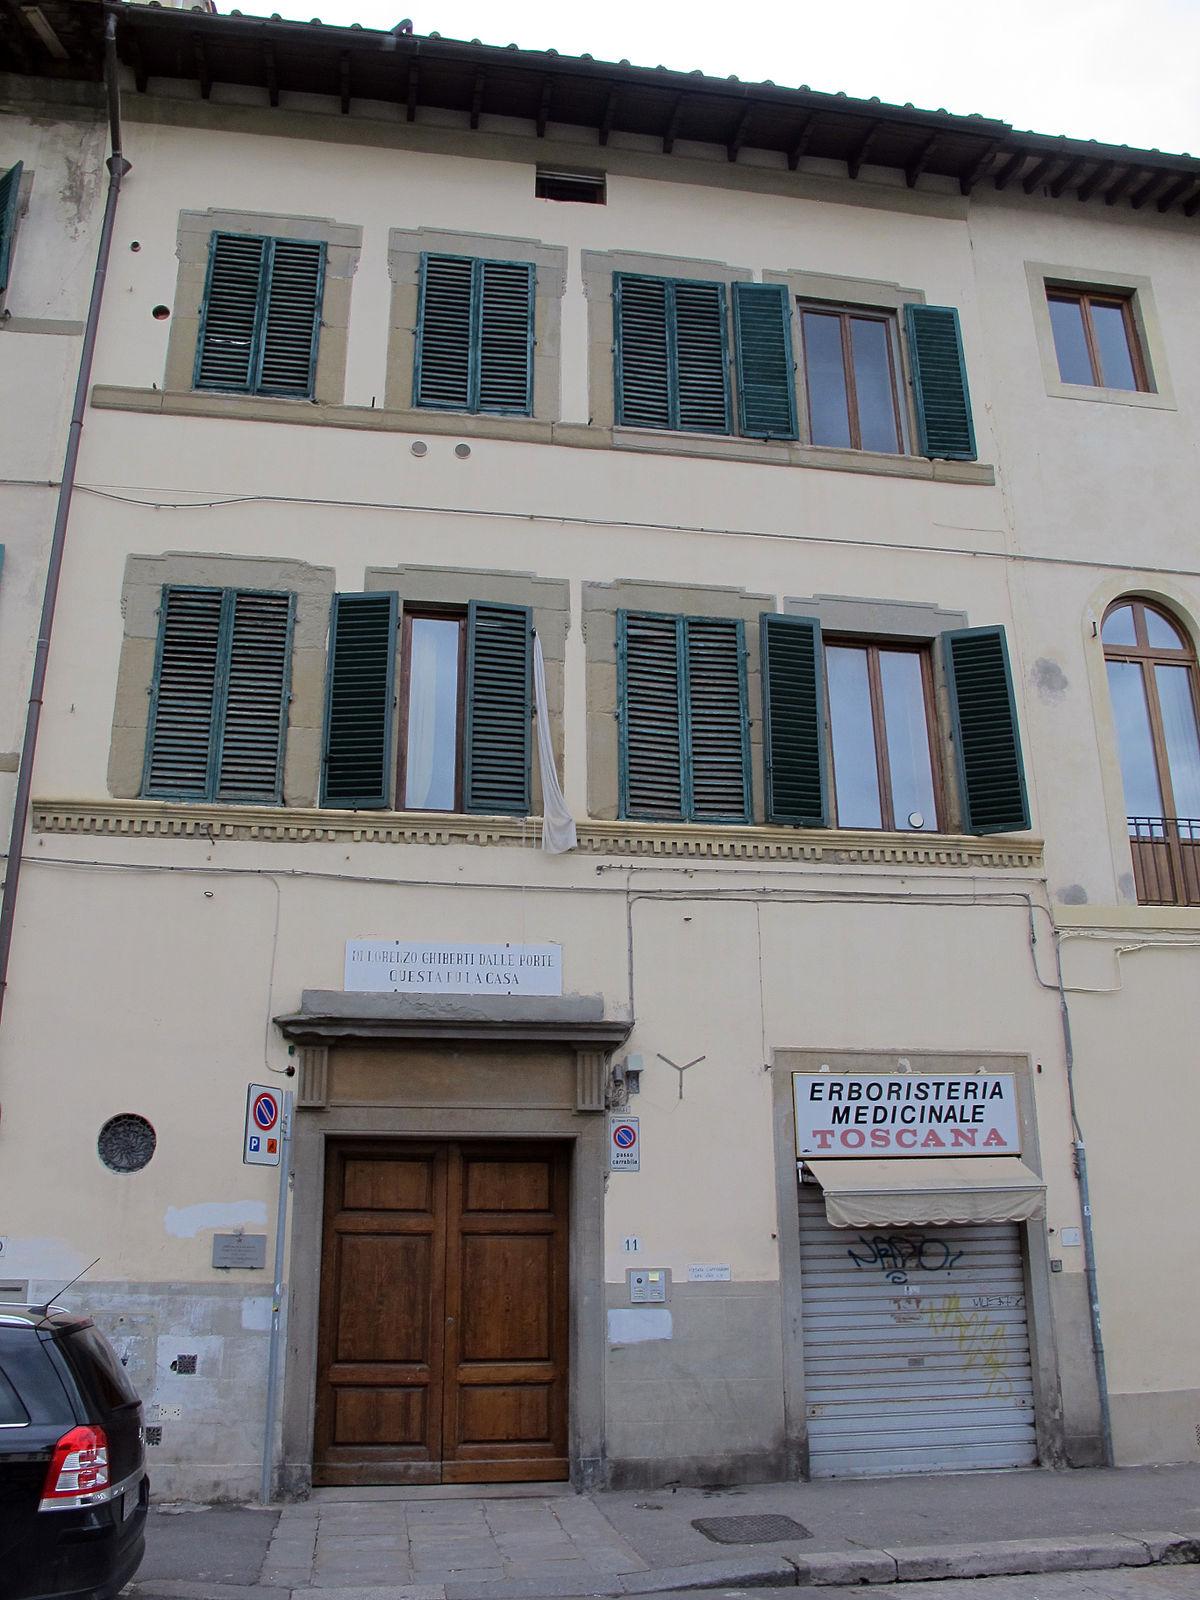 Casa di Lorenzo Ghiberti  Wikipedia